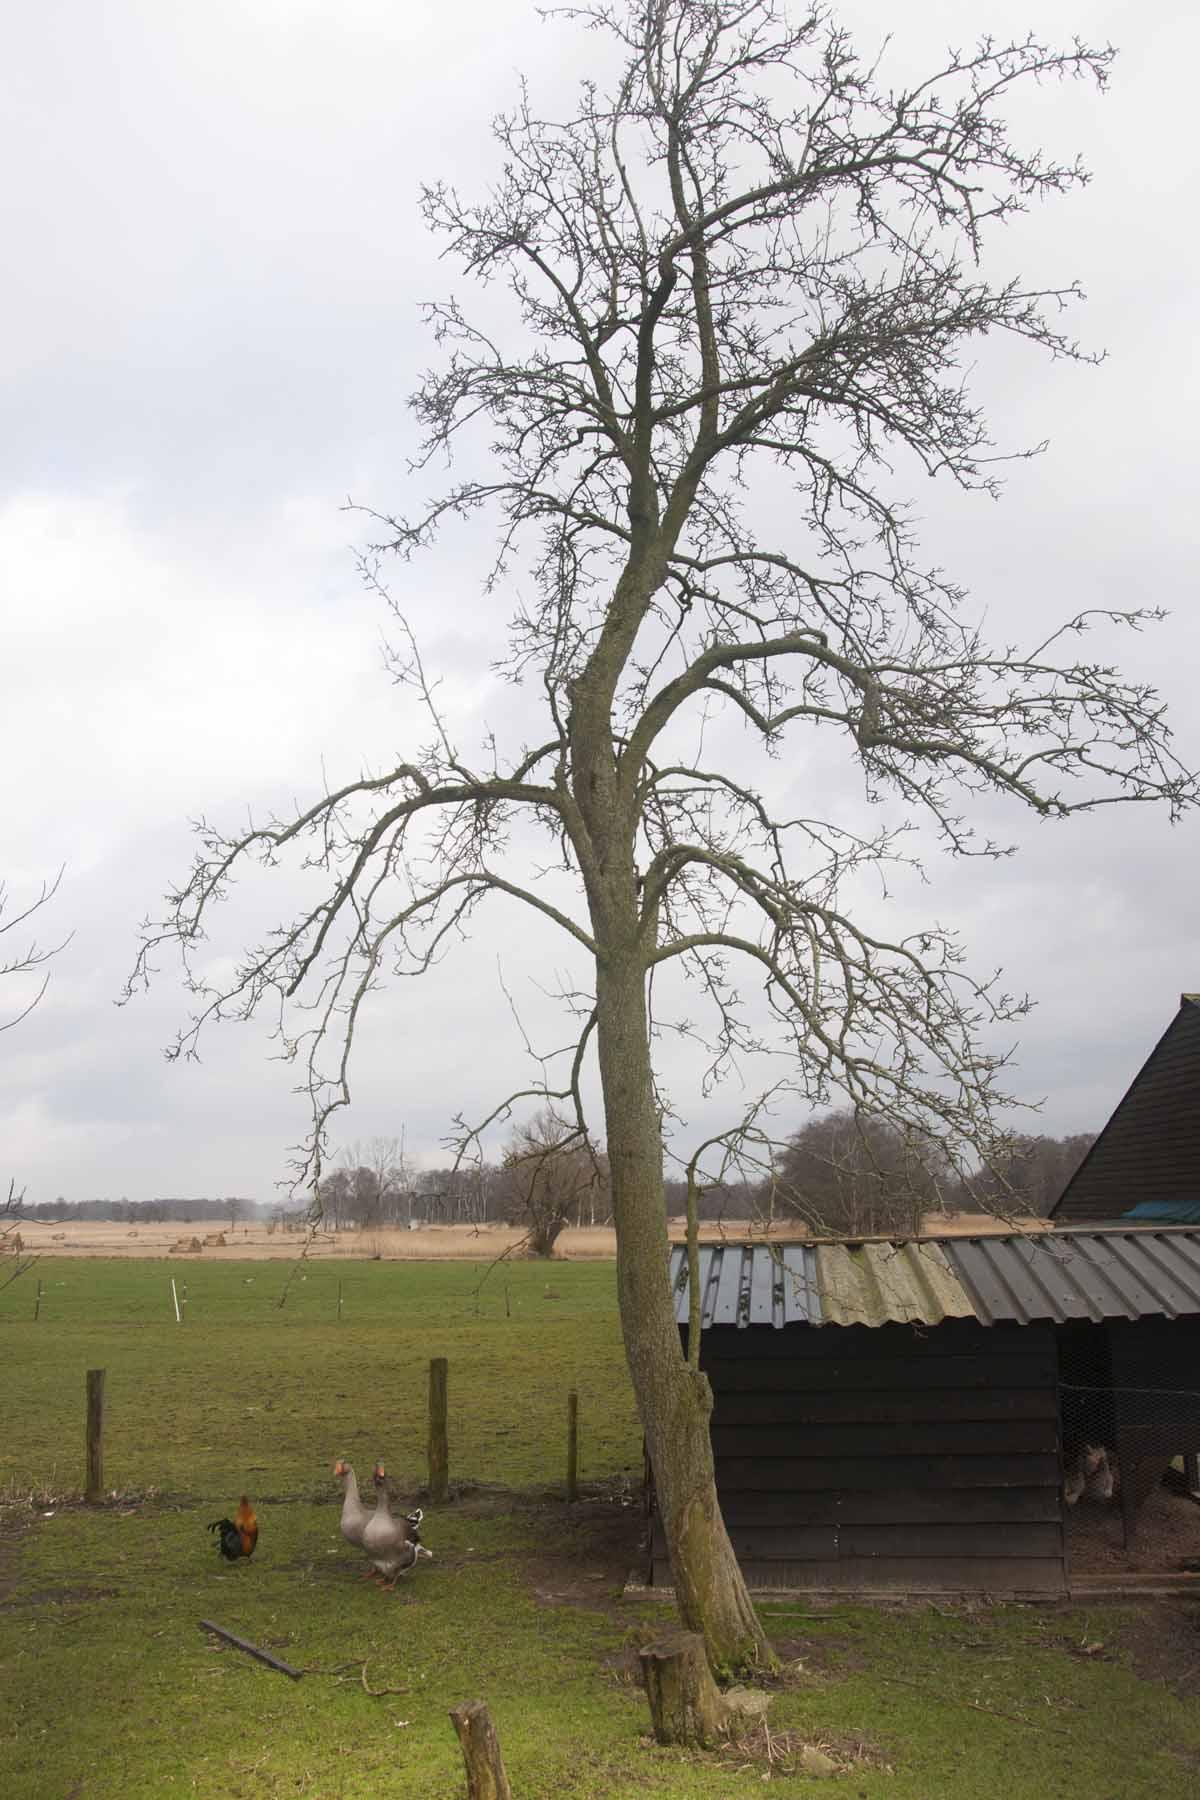 2014-02-22-hsb-st-jansklooster-5152